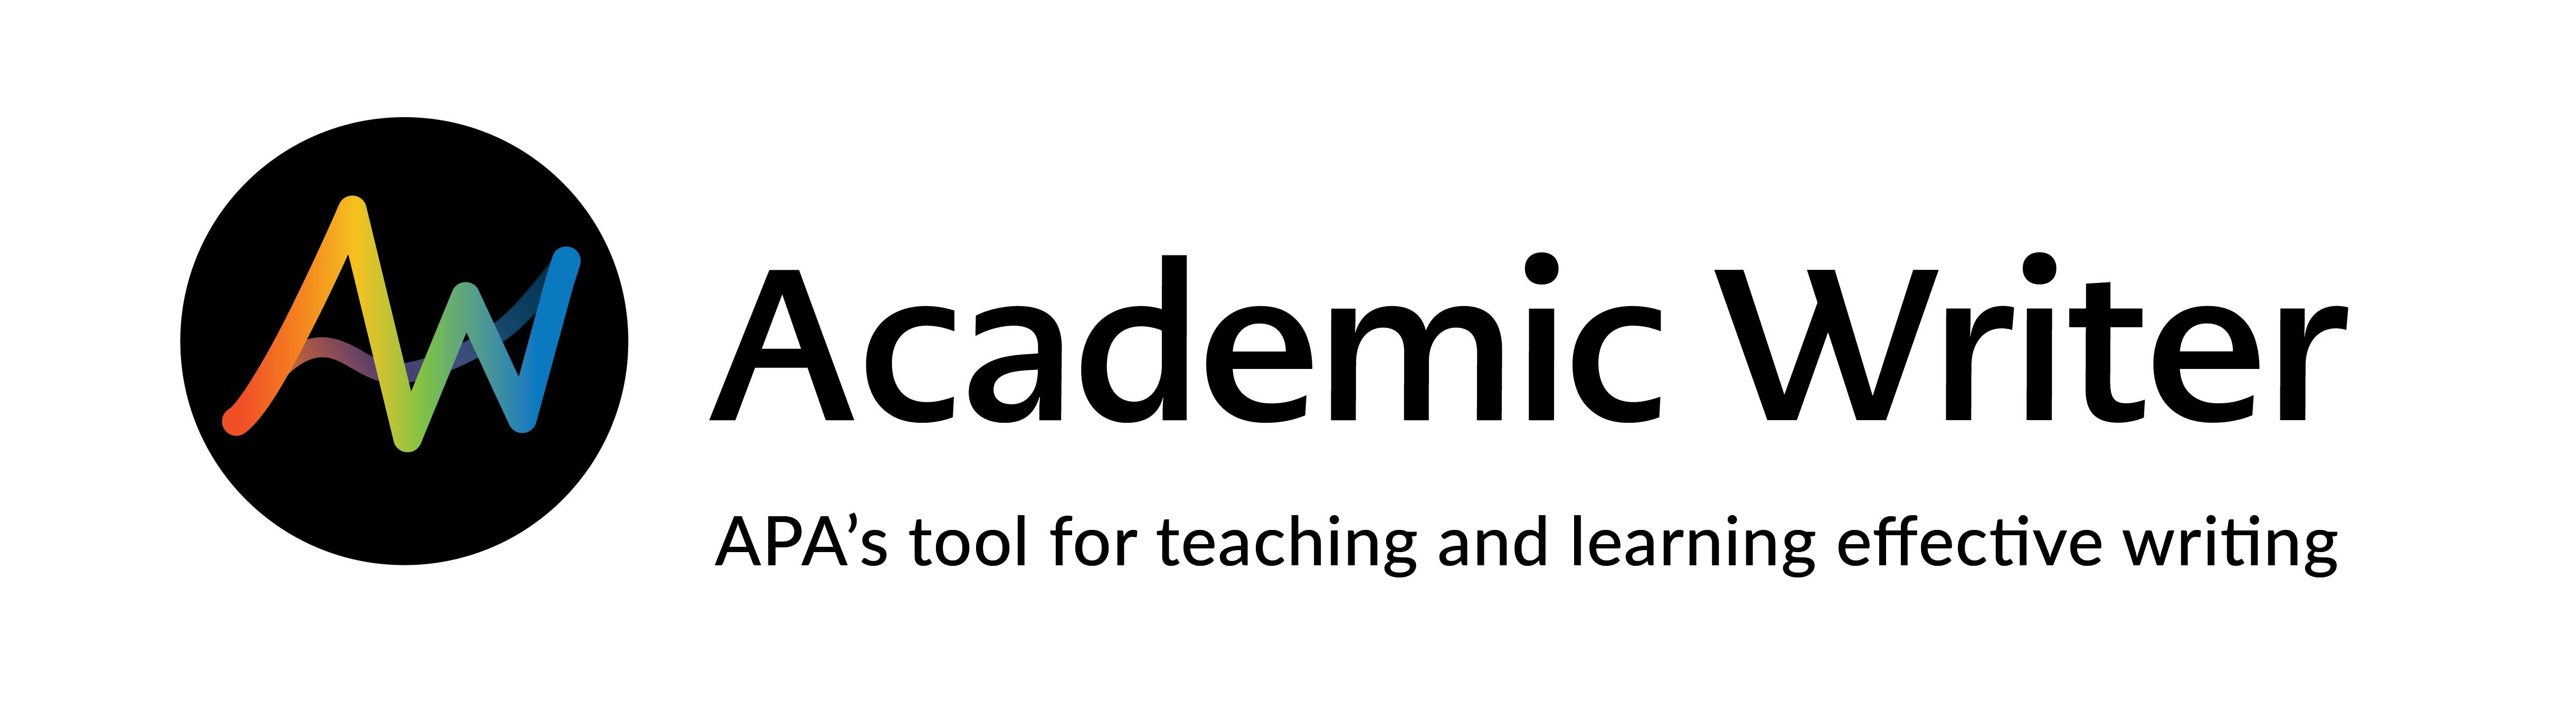 Logo for Academic Writer APA program